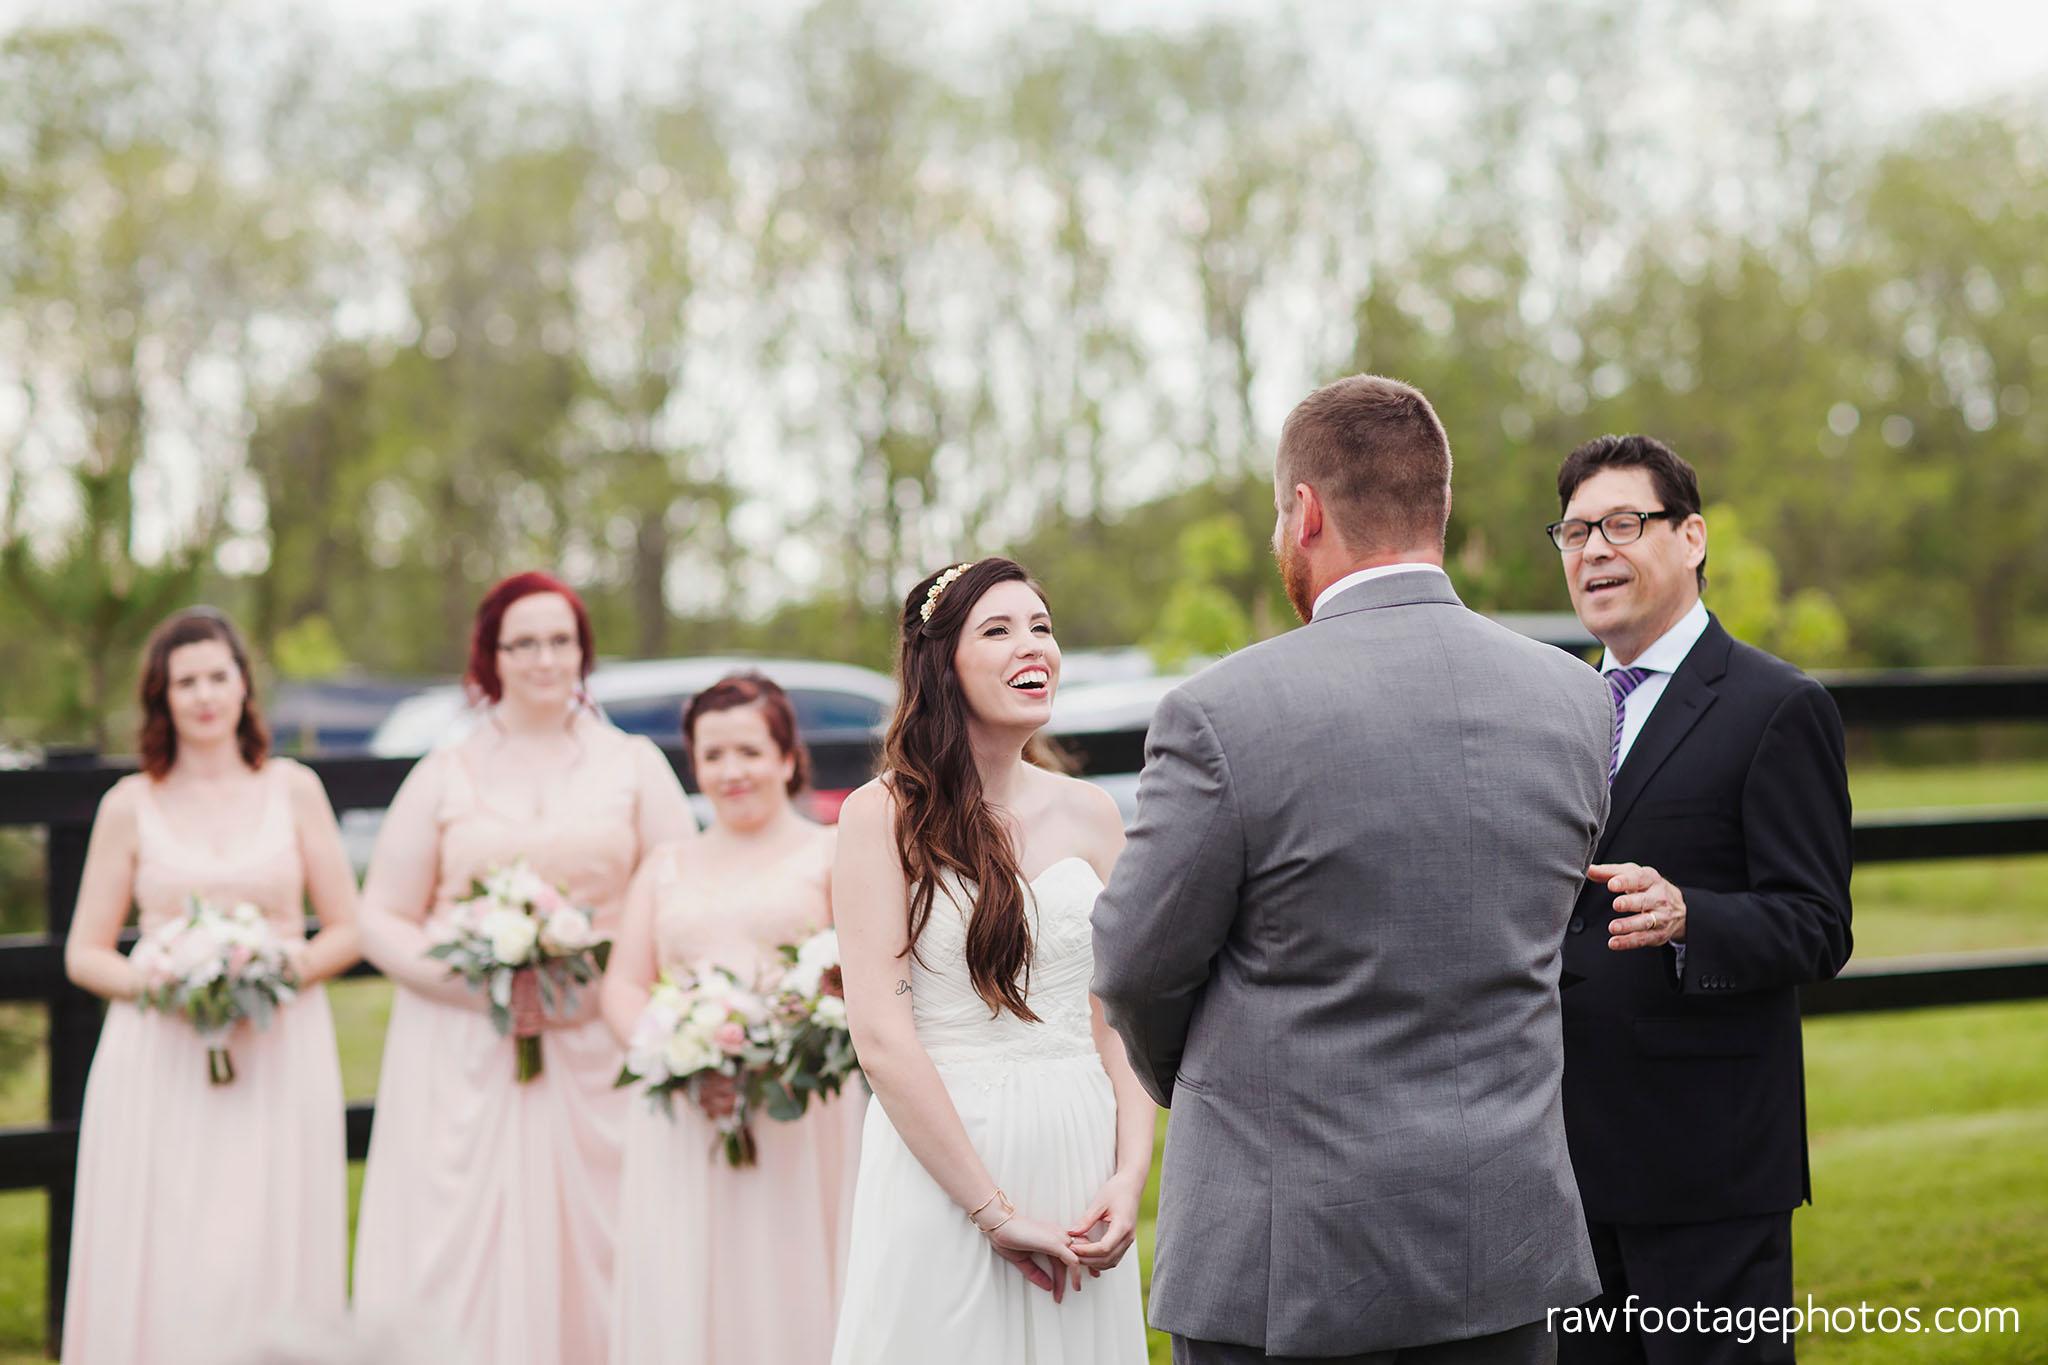 london_ontario_wedding_photographer-century_wedding_barn-raw_footage_photography-diy_wedding069.jpg